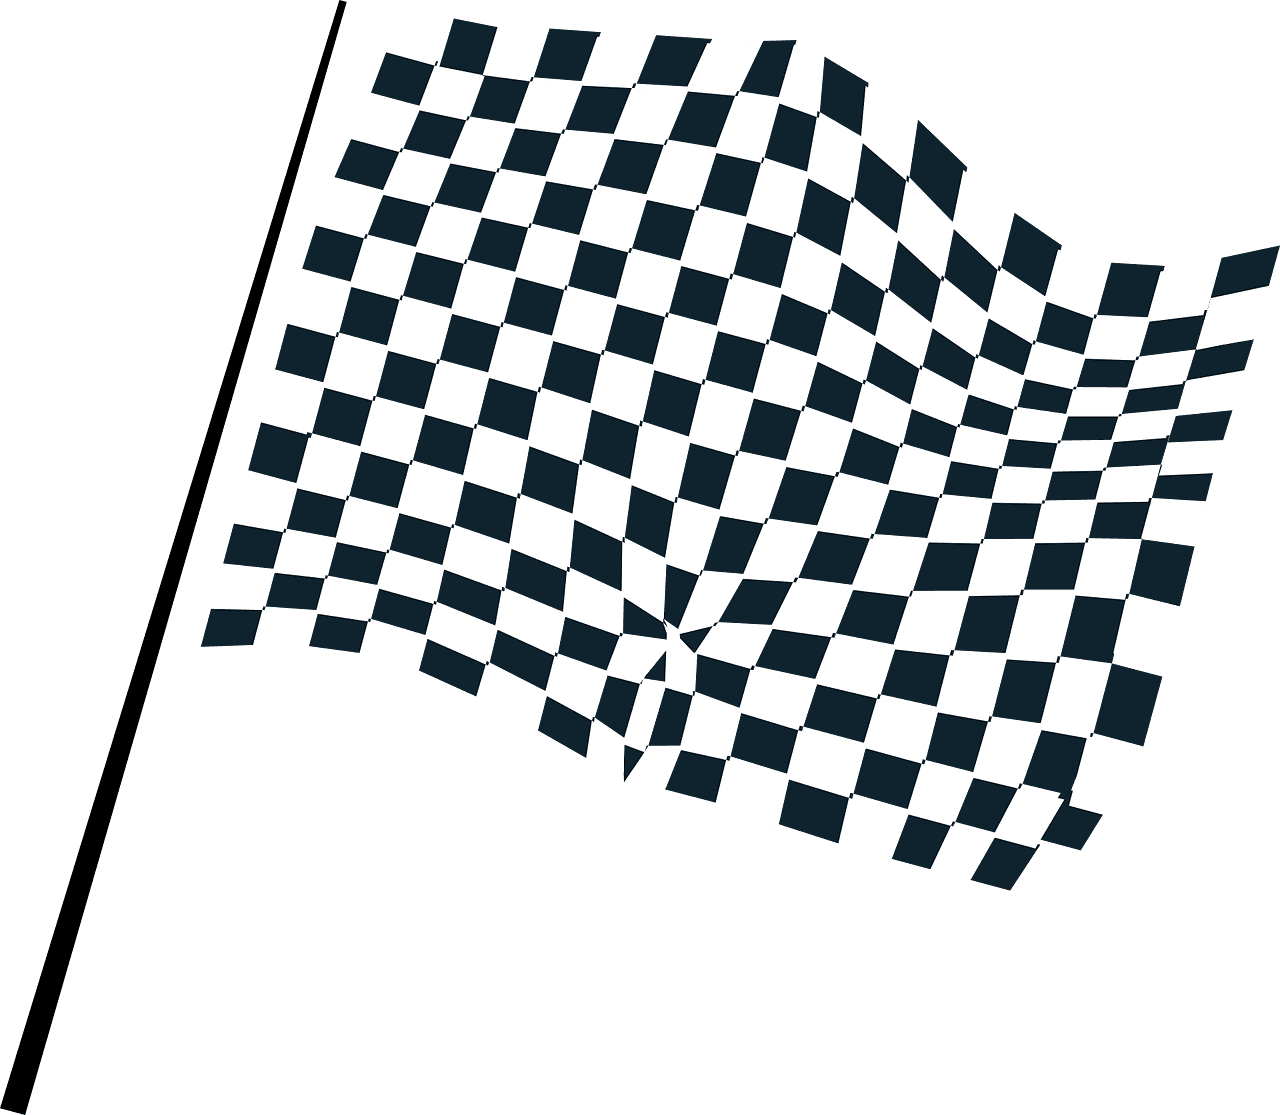 Race clipart starting point. Motocross training academy online